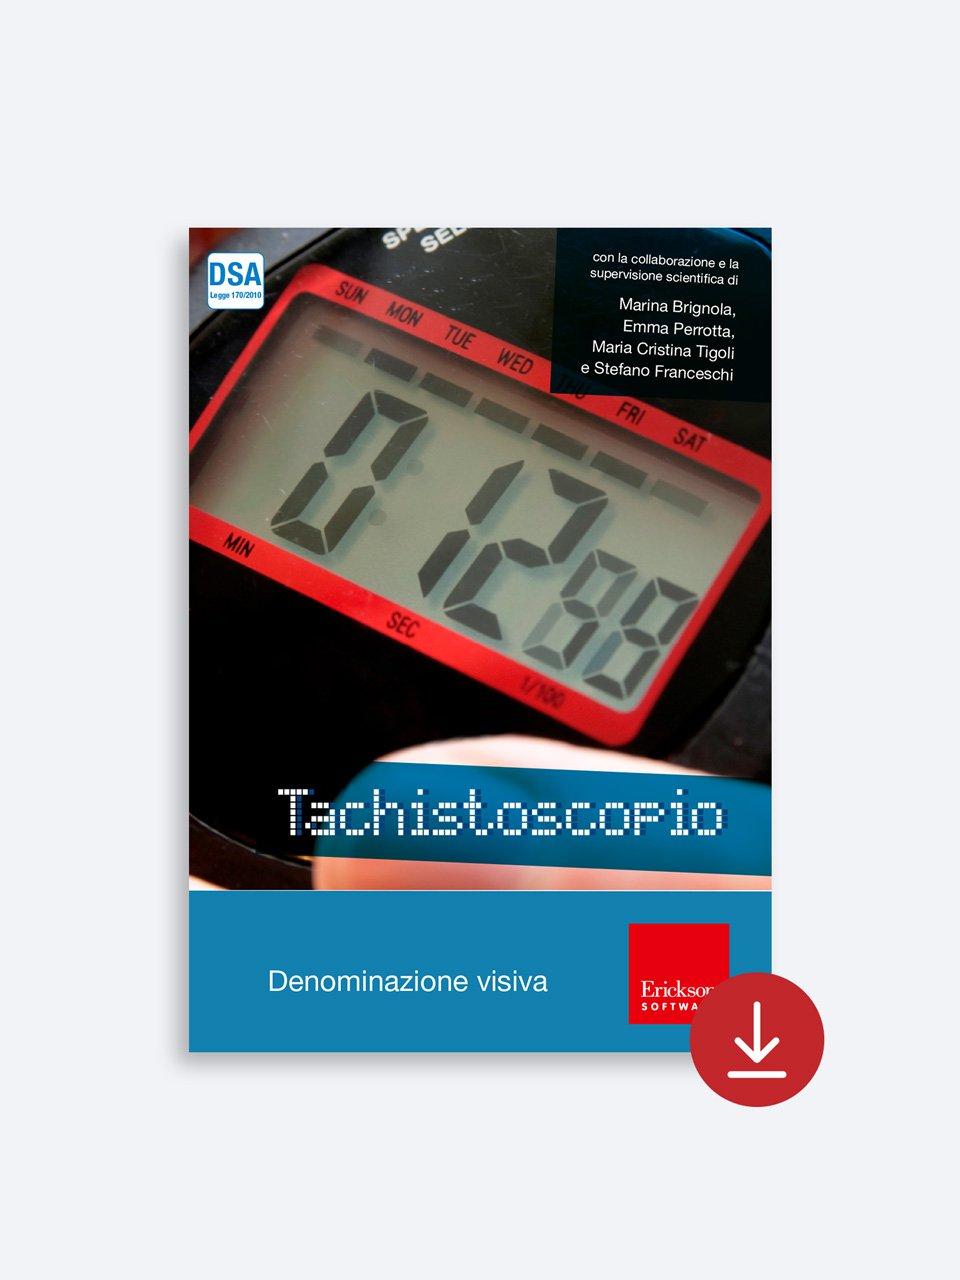 Tachistoscopio SUITE - App e software - Erickson 3